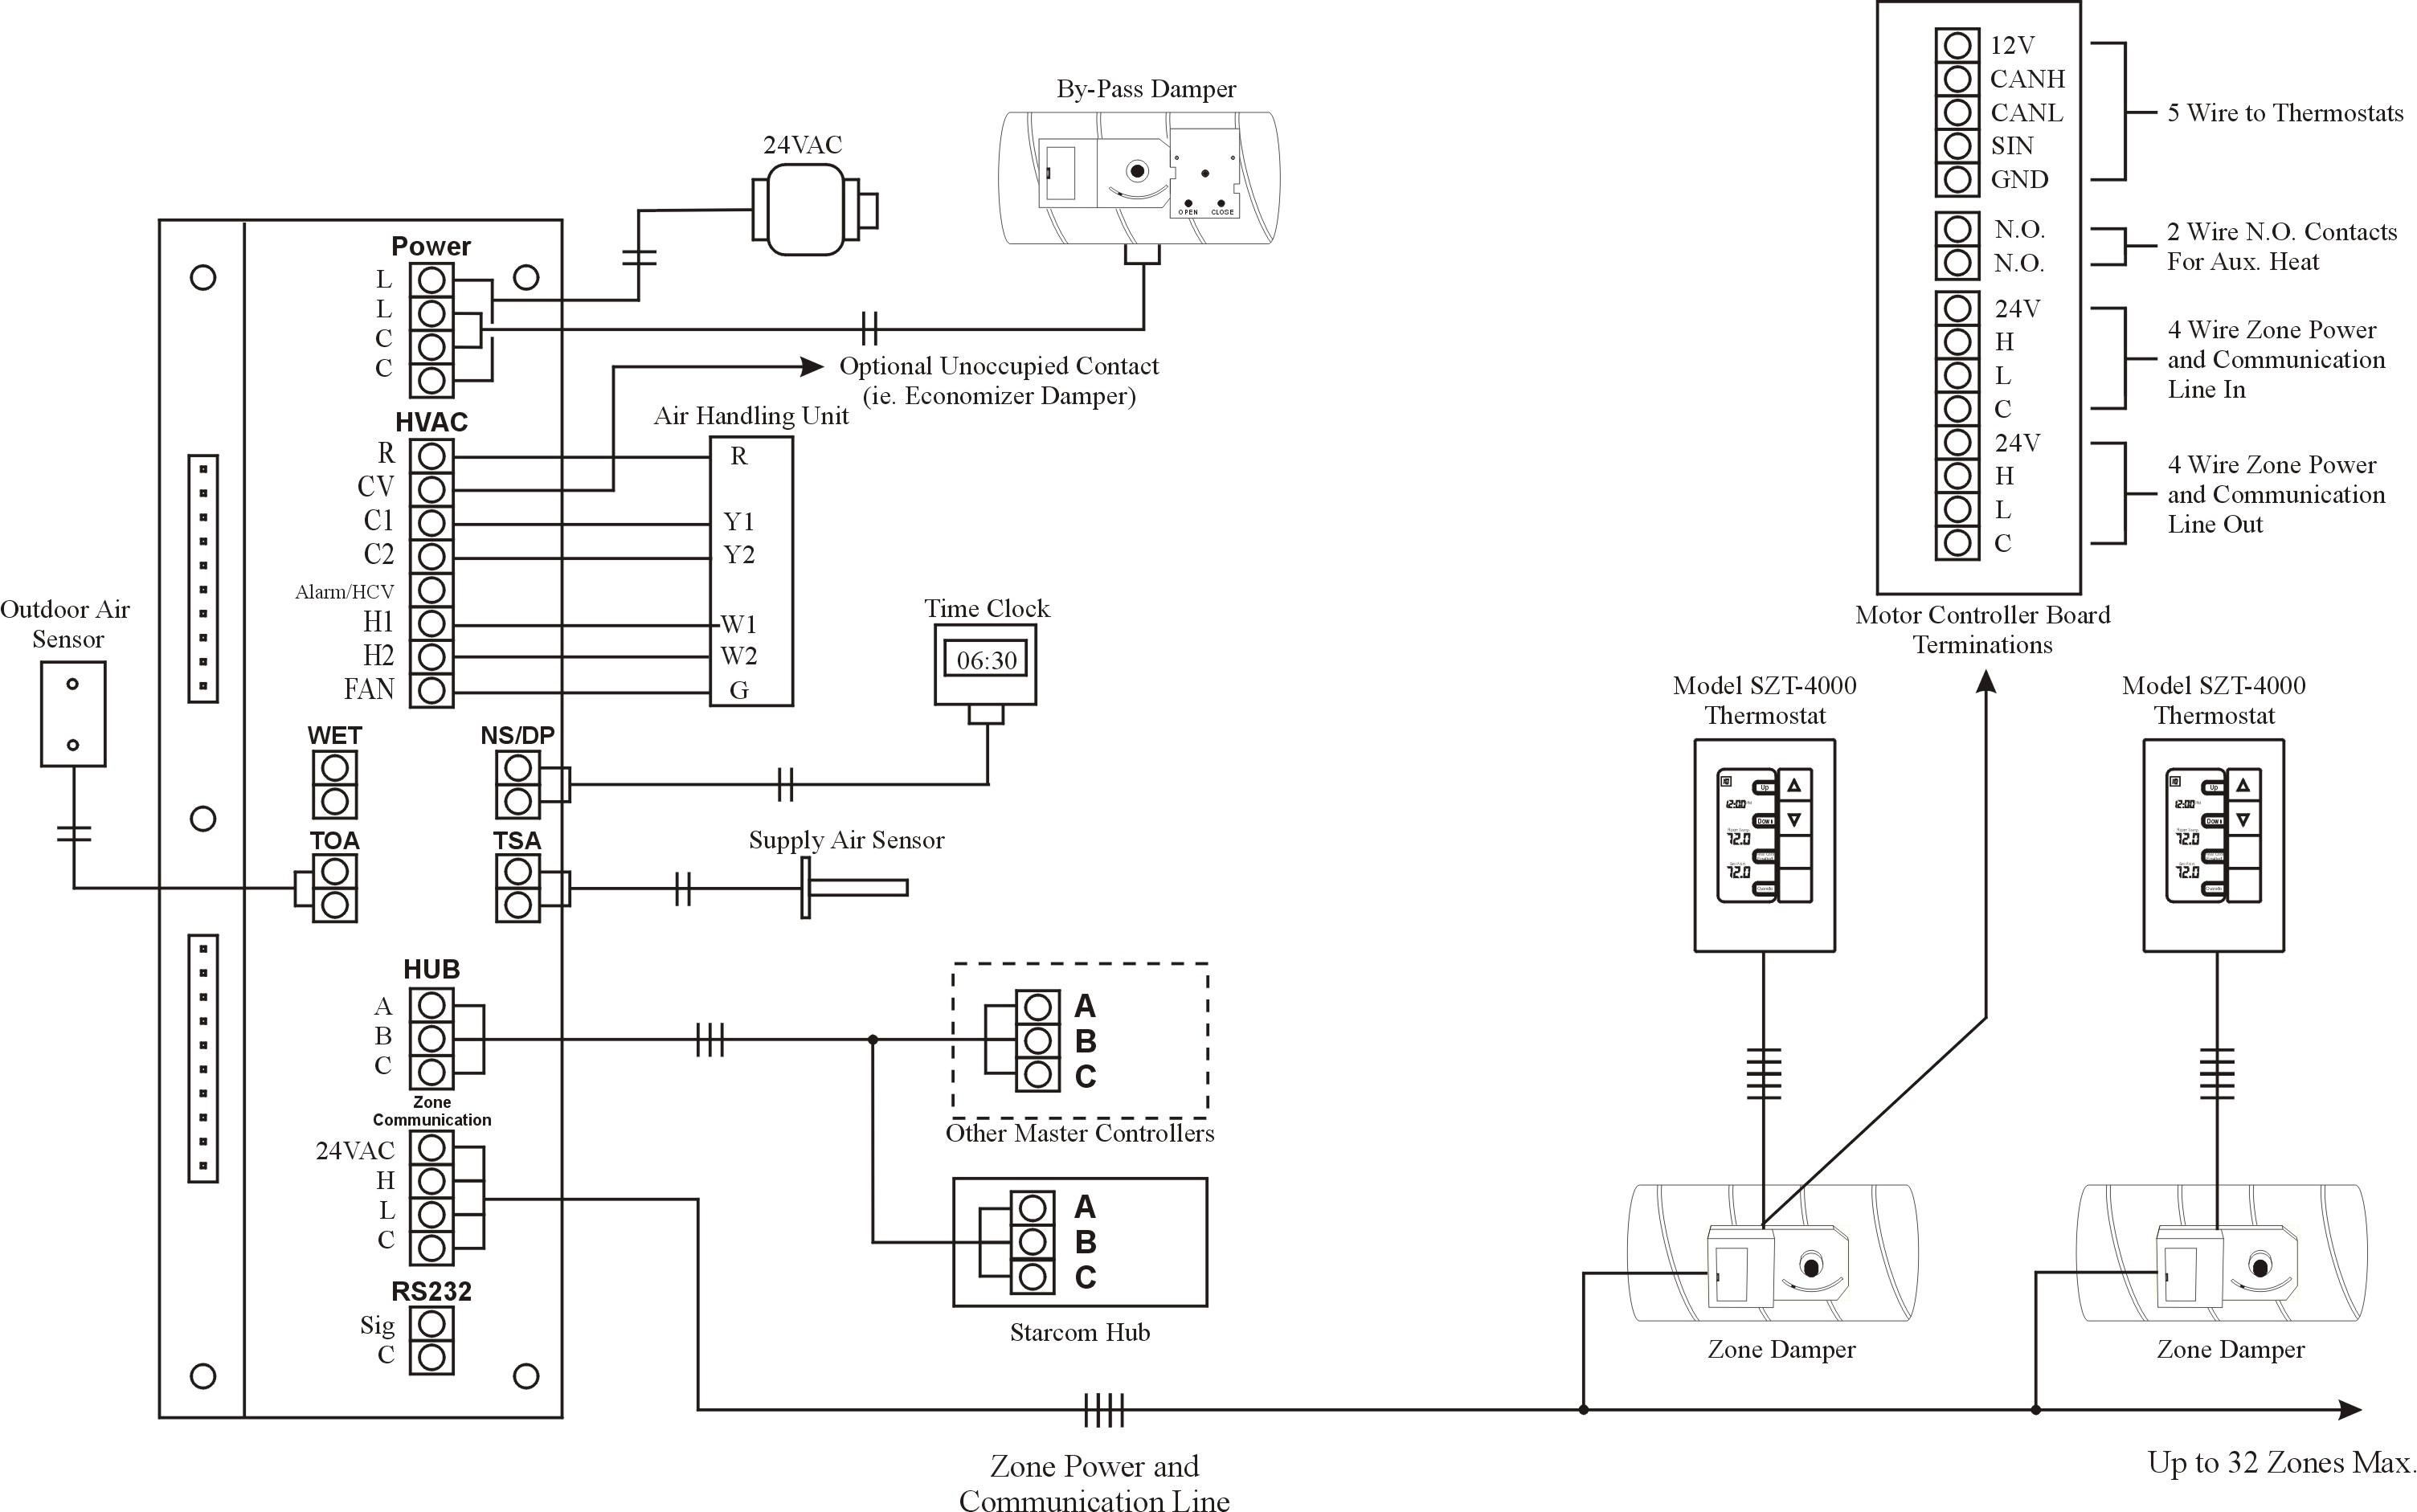 DIAGRAM] Auto Zone Cadillac Wiring Diagrams FULL Version HD Quality Wiring  Diagrams - PAPERDIAGRAM.SORAGNAWEB.ITSoragna Web